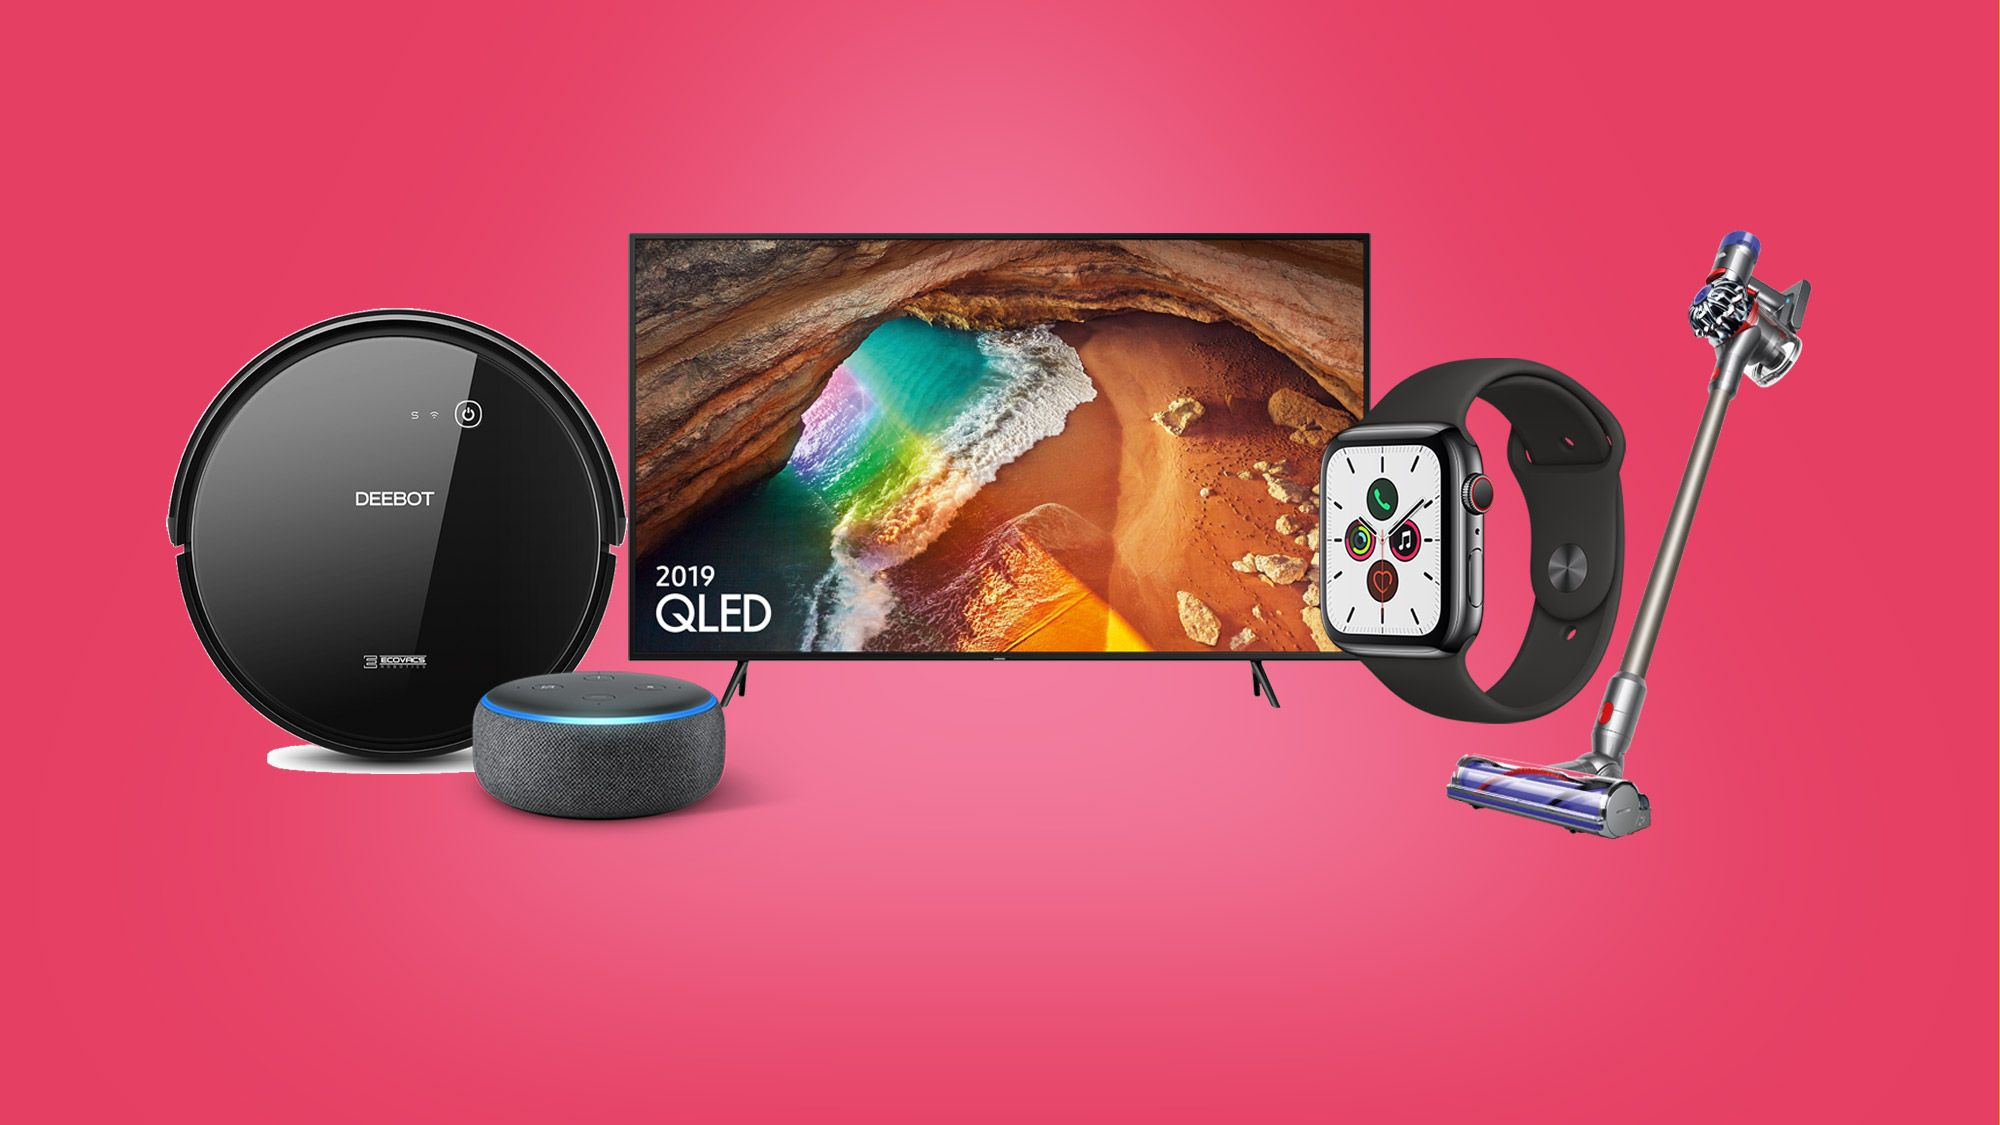 Amazon S Pre Black Friday Sale Includes Deals On Tvs Laptops Headphones More Best Cyber Monday Deals Pre Black Friday Sales Pre Black Friday